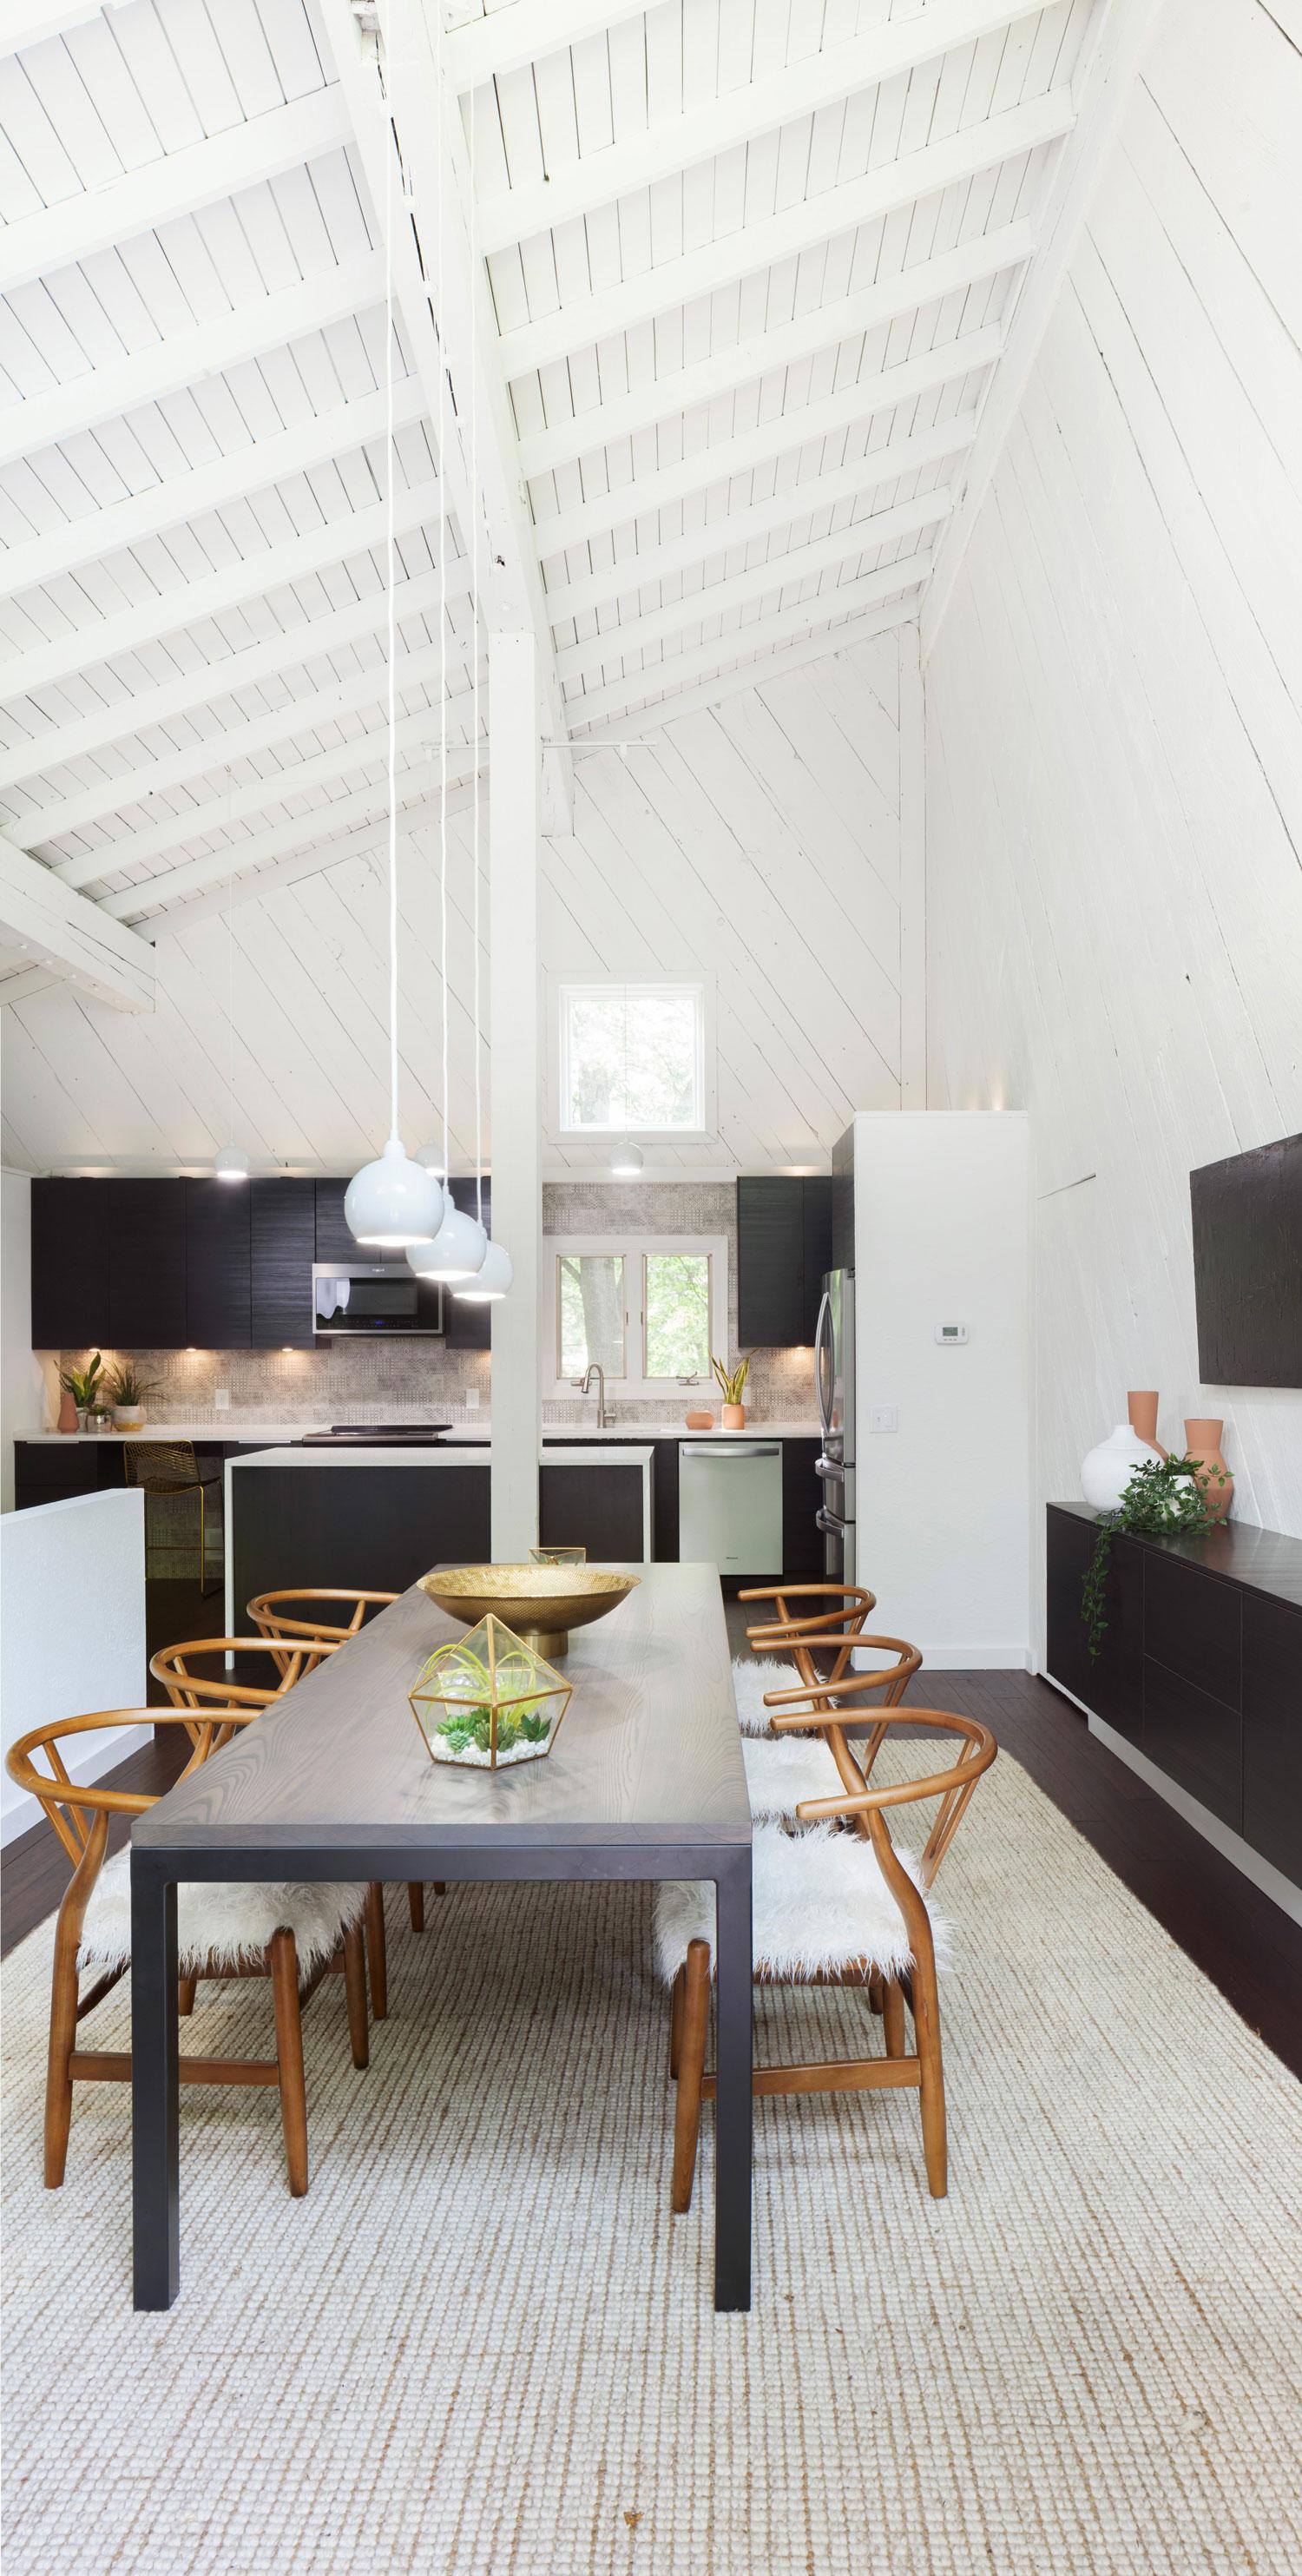 minneapolis-st-paul-home-decor-interior-designer-interior-stylist-interior-design-9.jpg